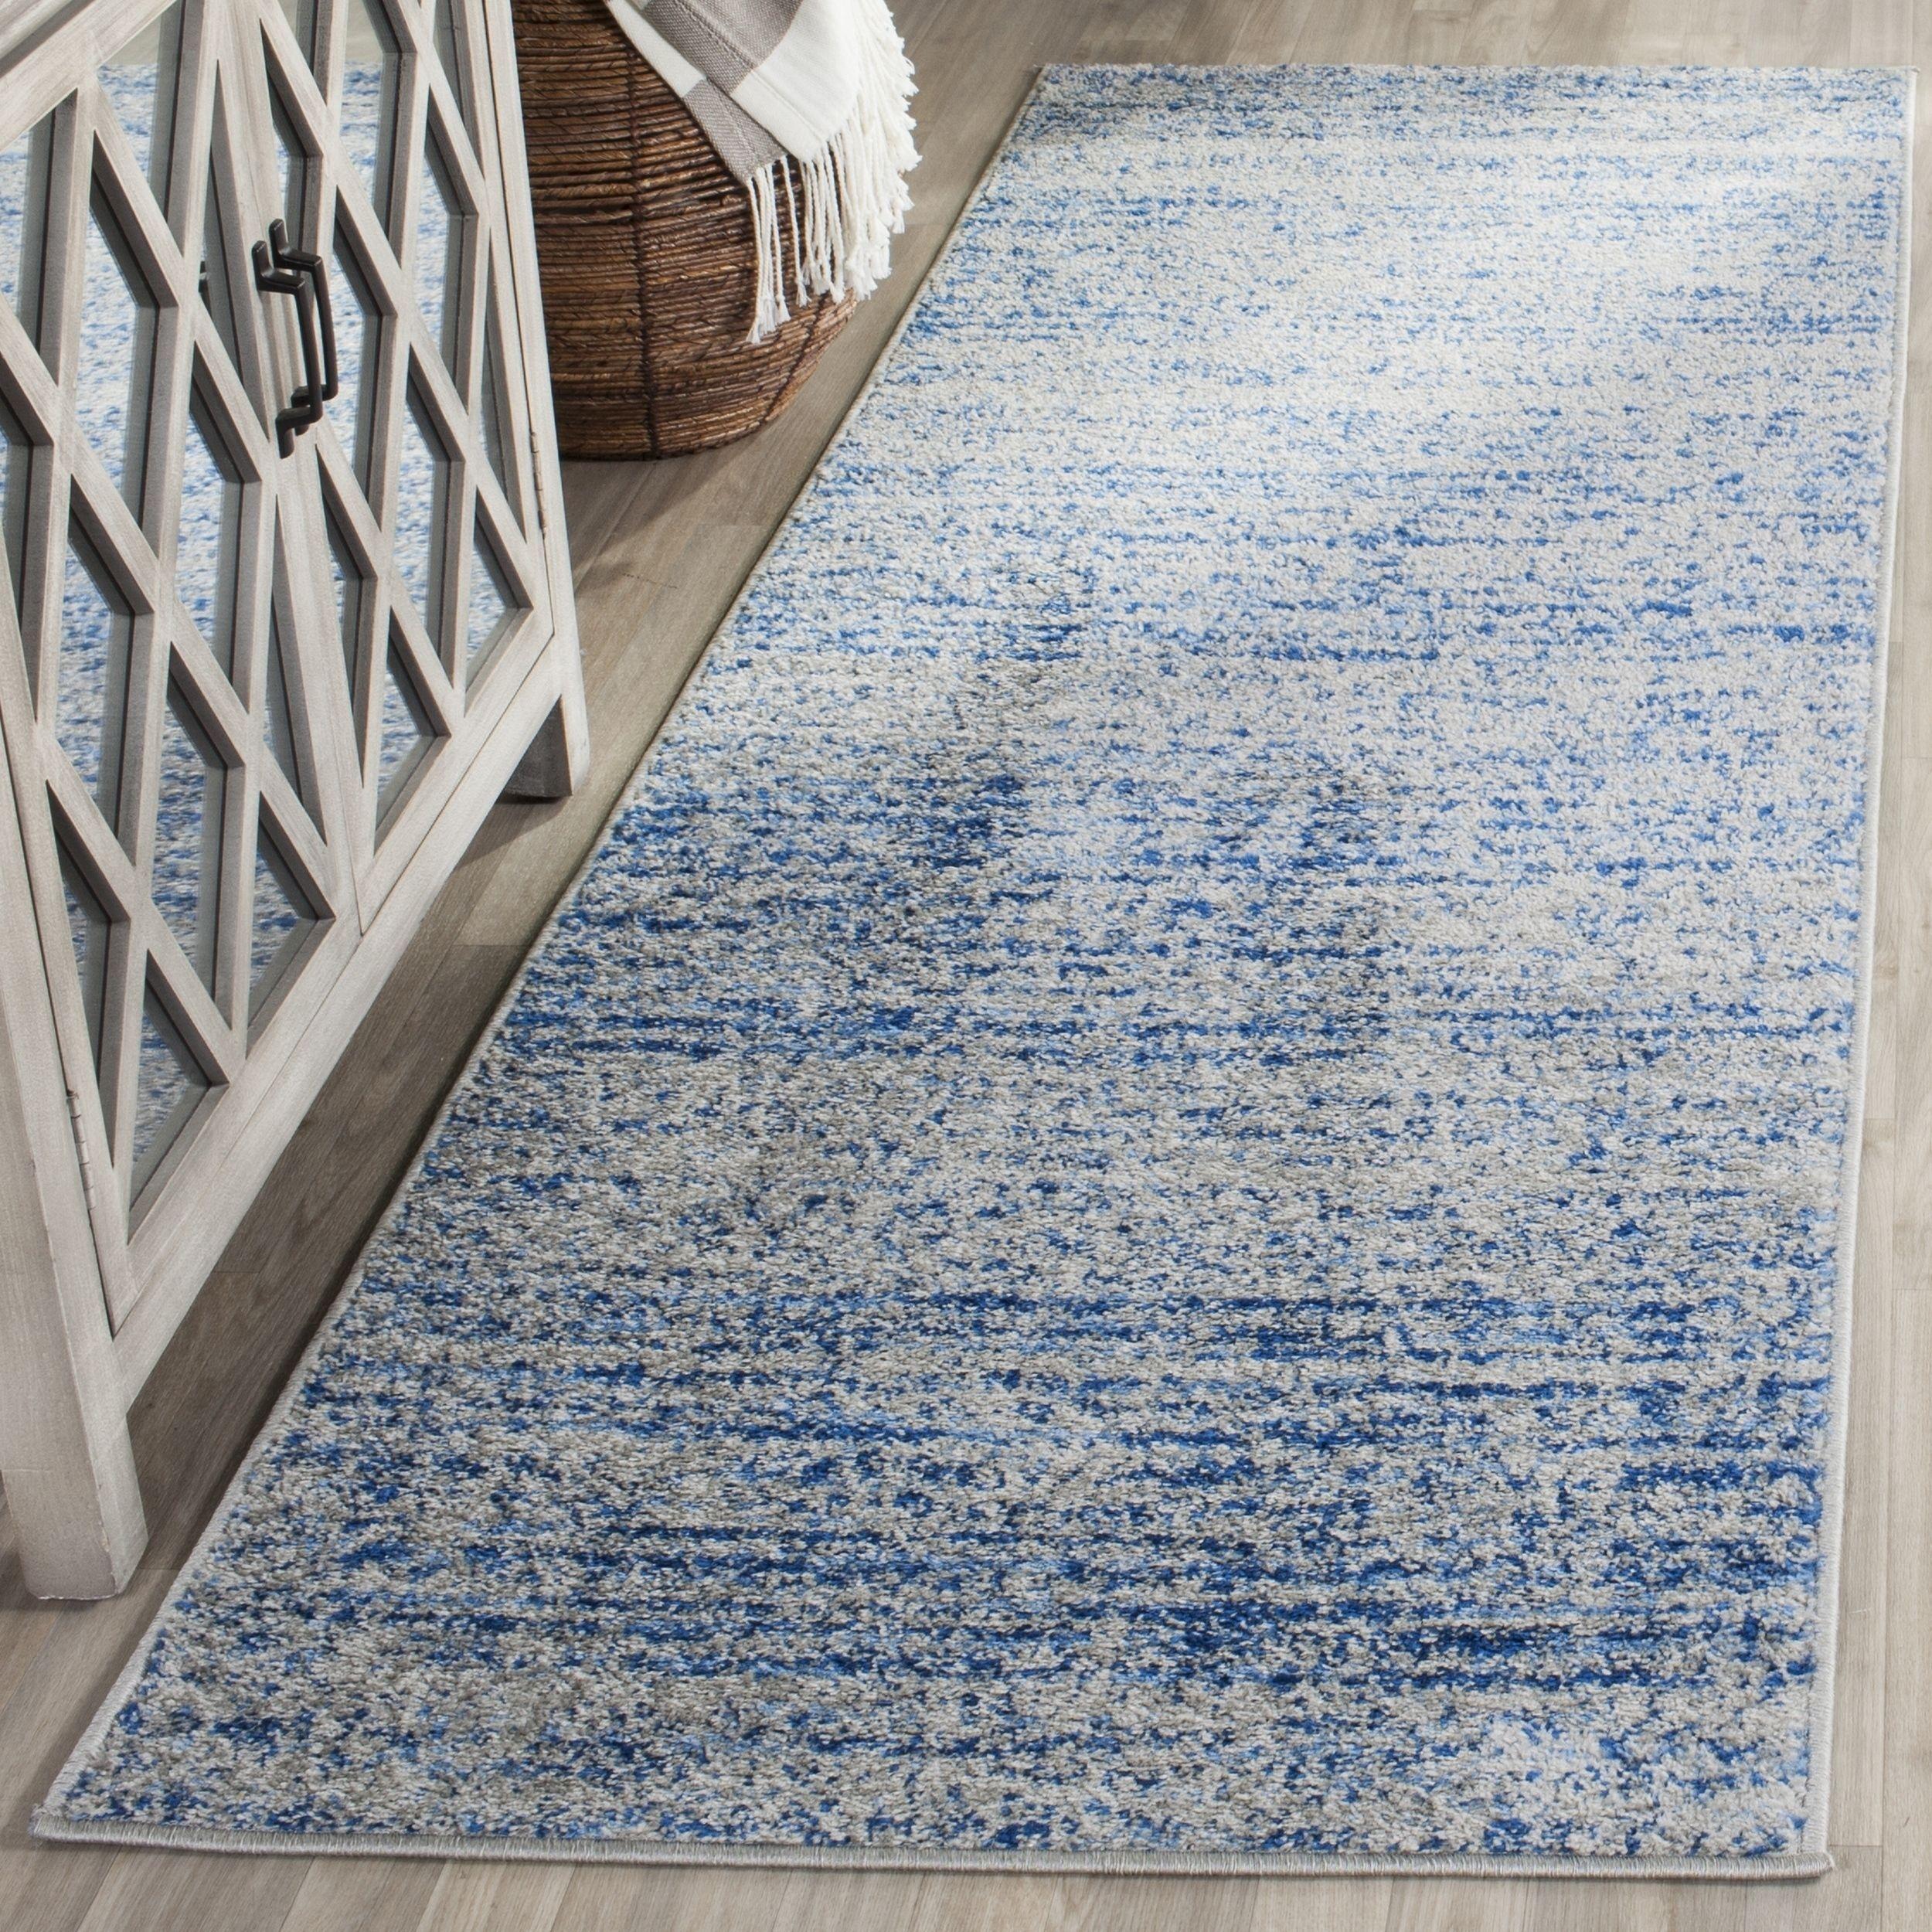 rug blue handmade rugsville rugs moroccan aqua cm textured modern soft x